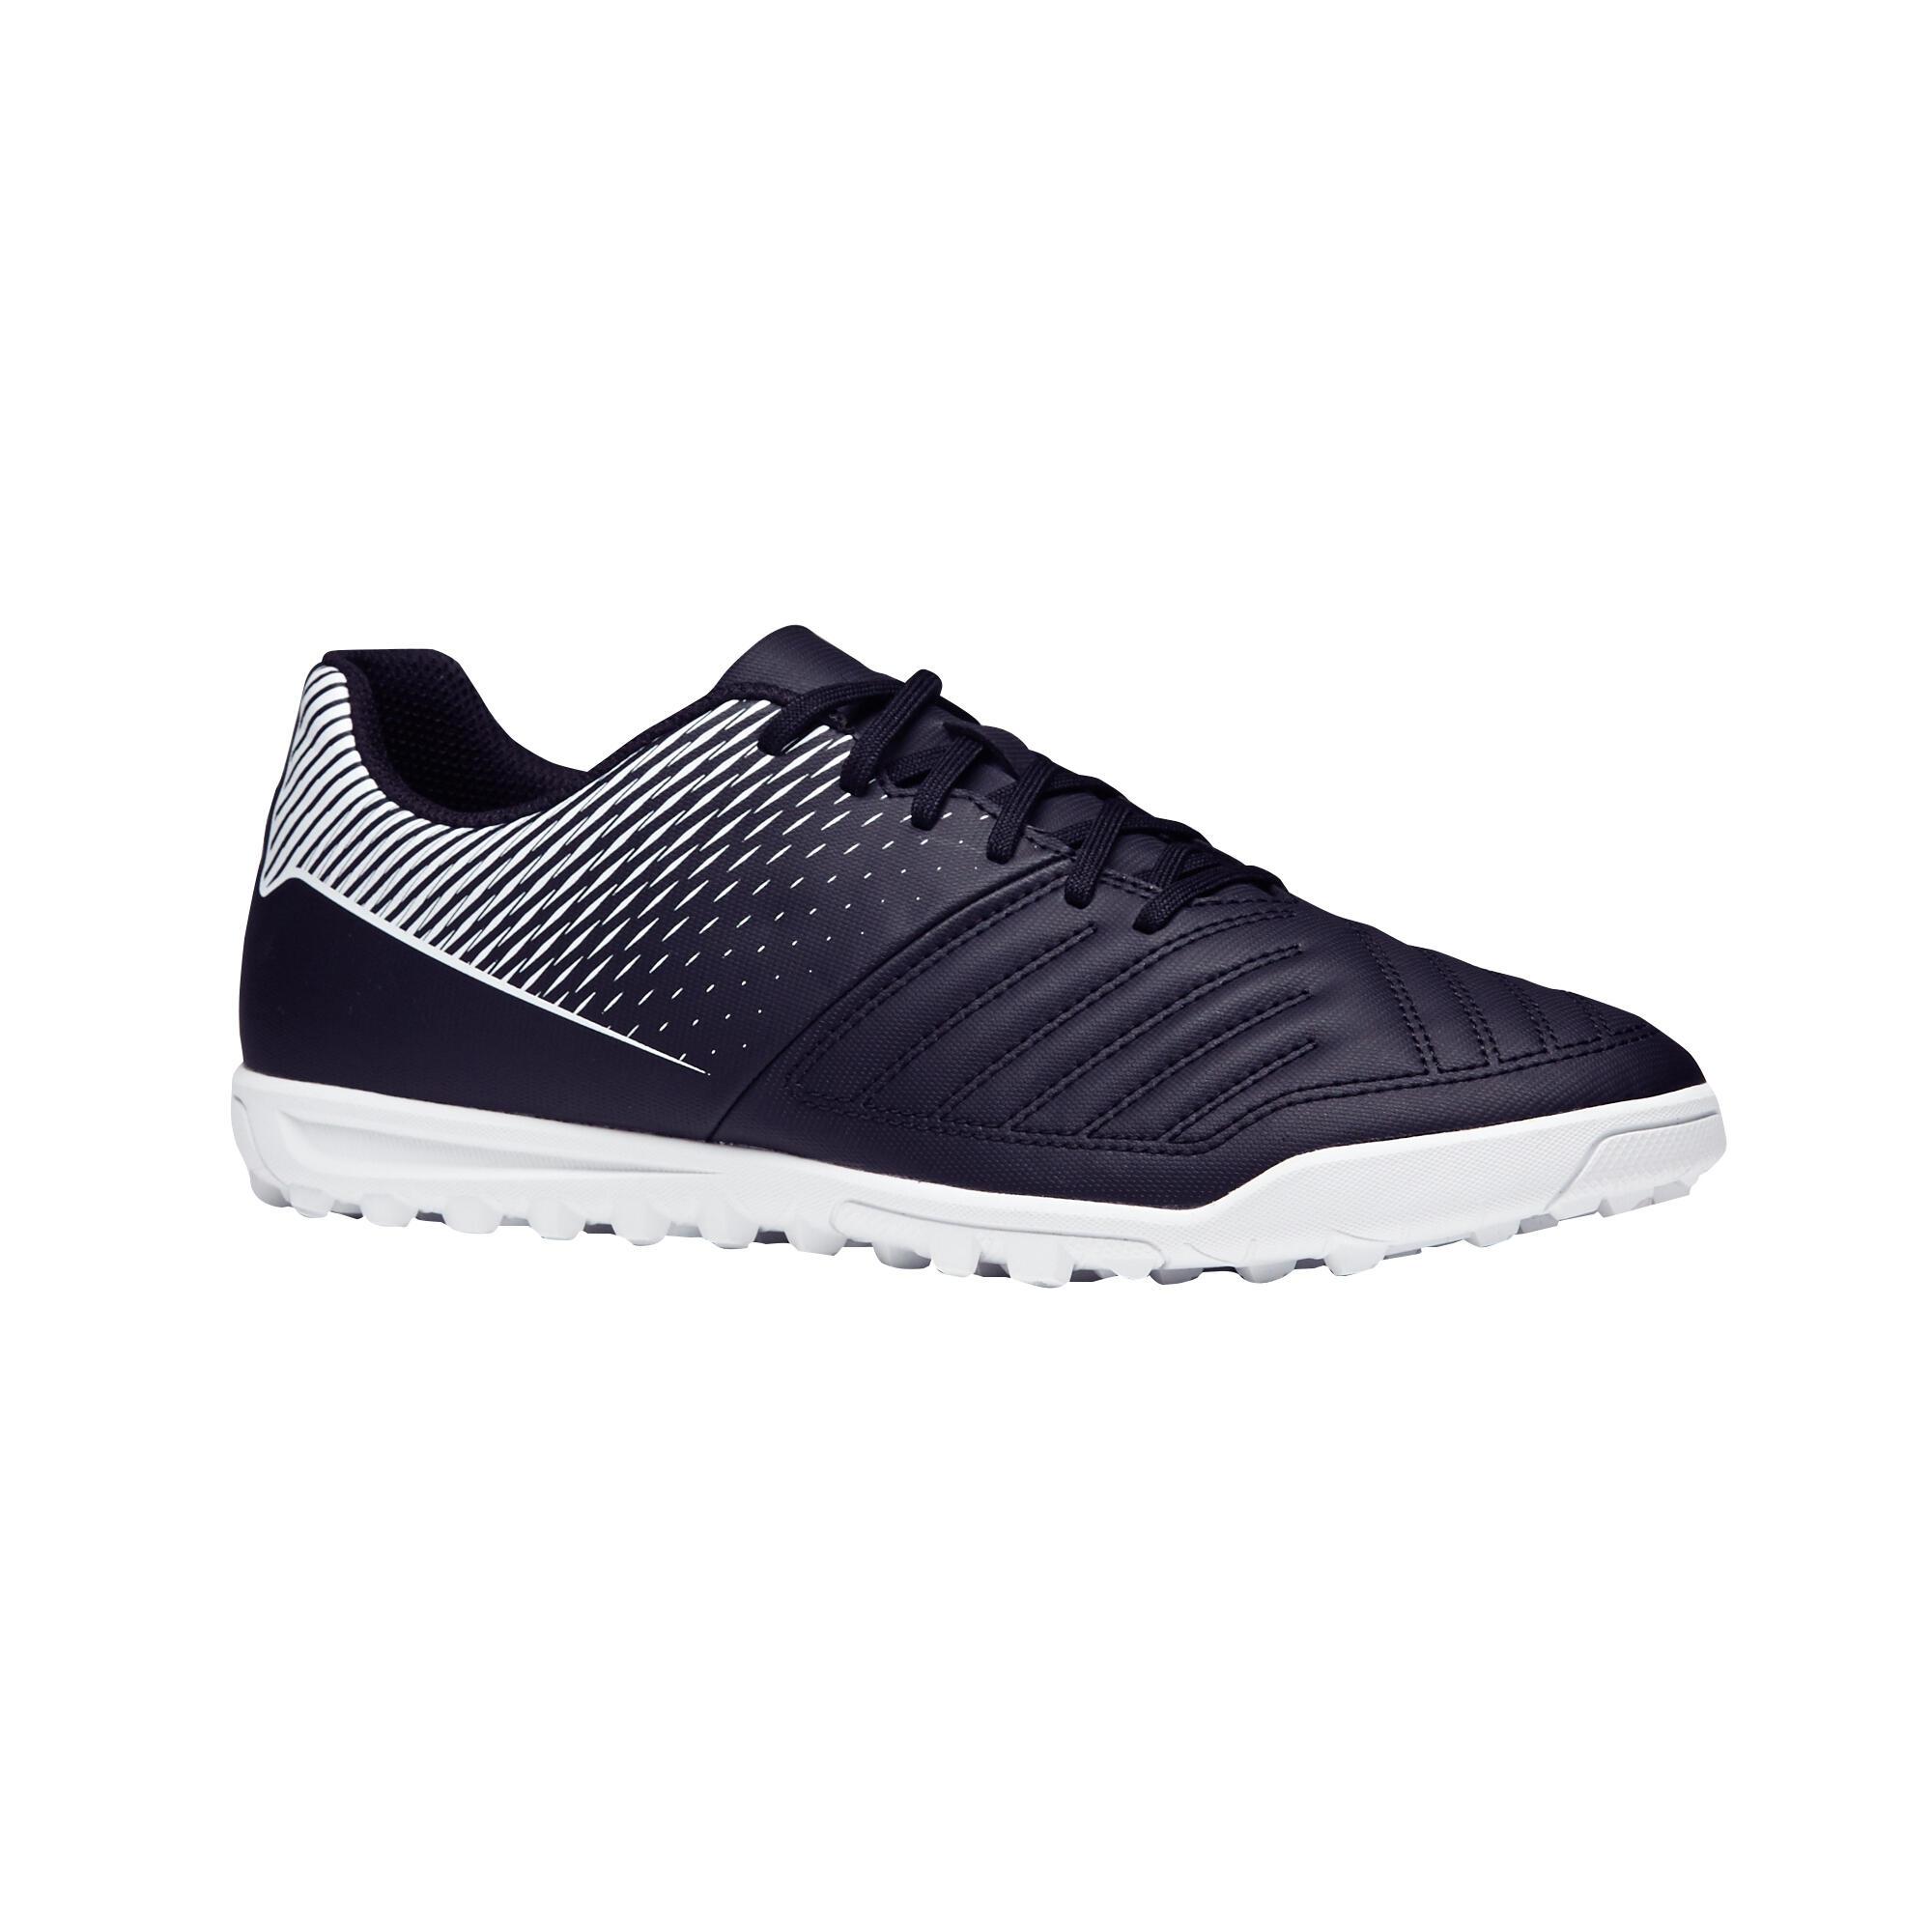 Shoes Online For Men Starting @ ₹229   Buy Men's Shoes